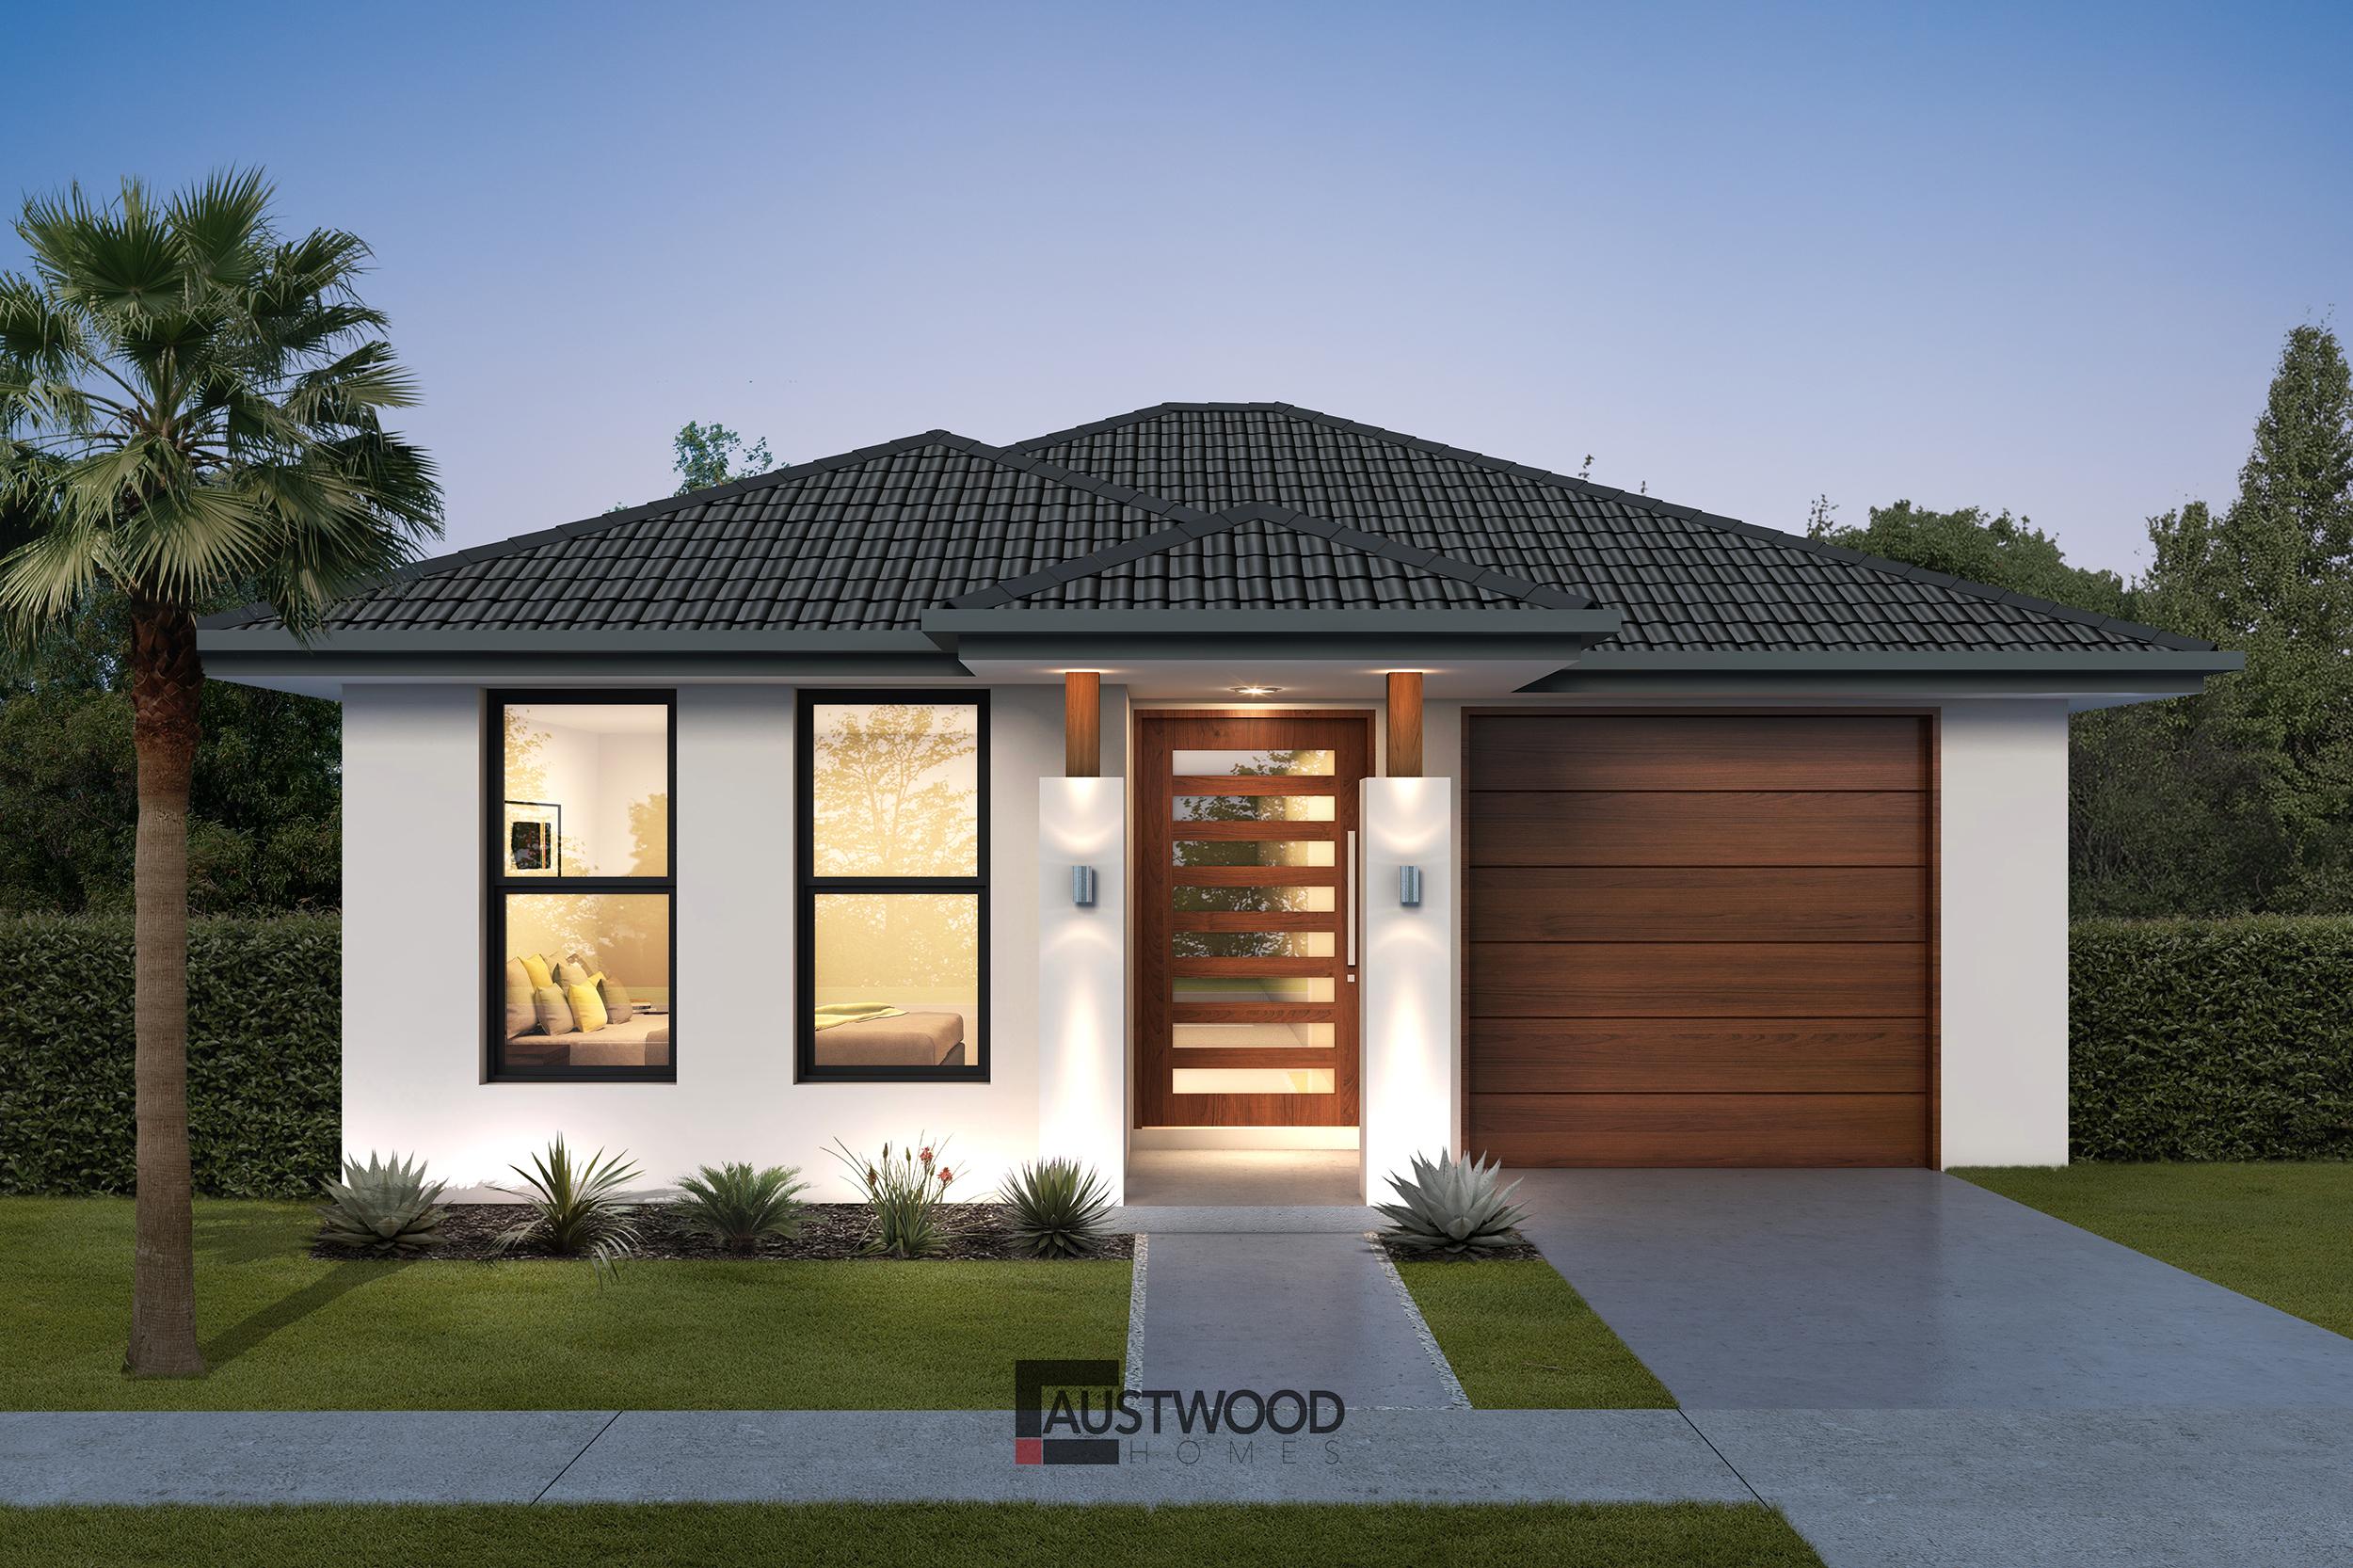 Austwood Homes Building Company Australia House And Land